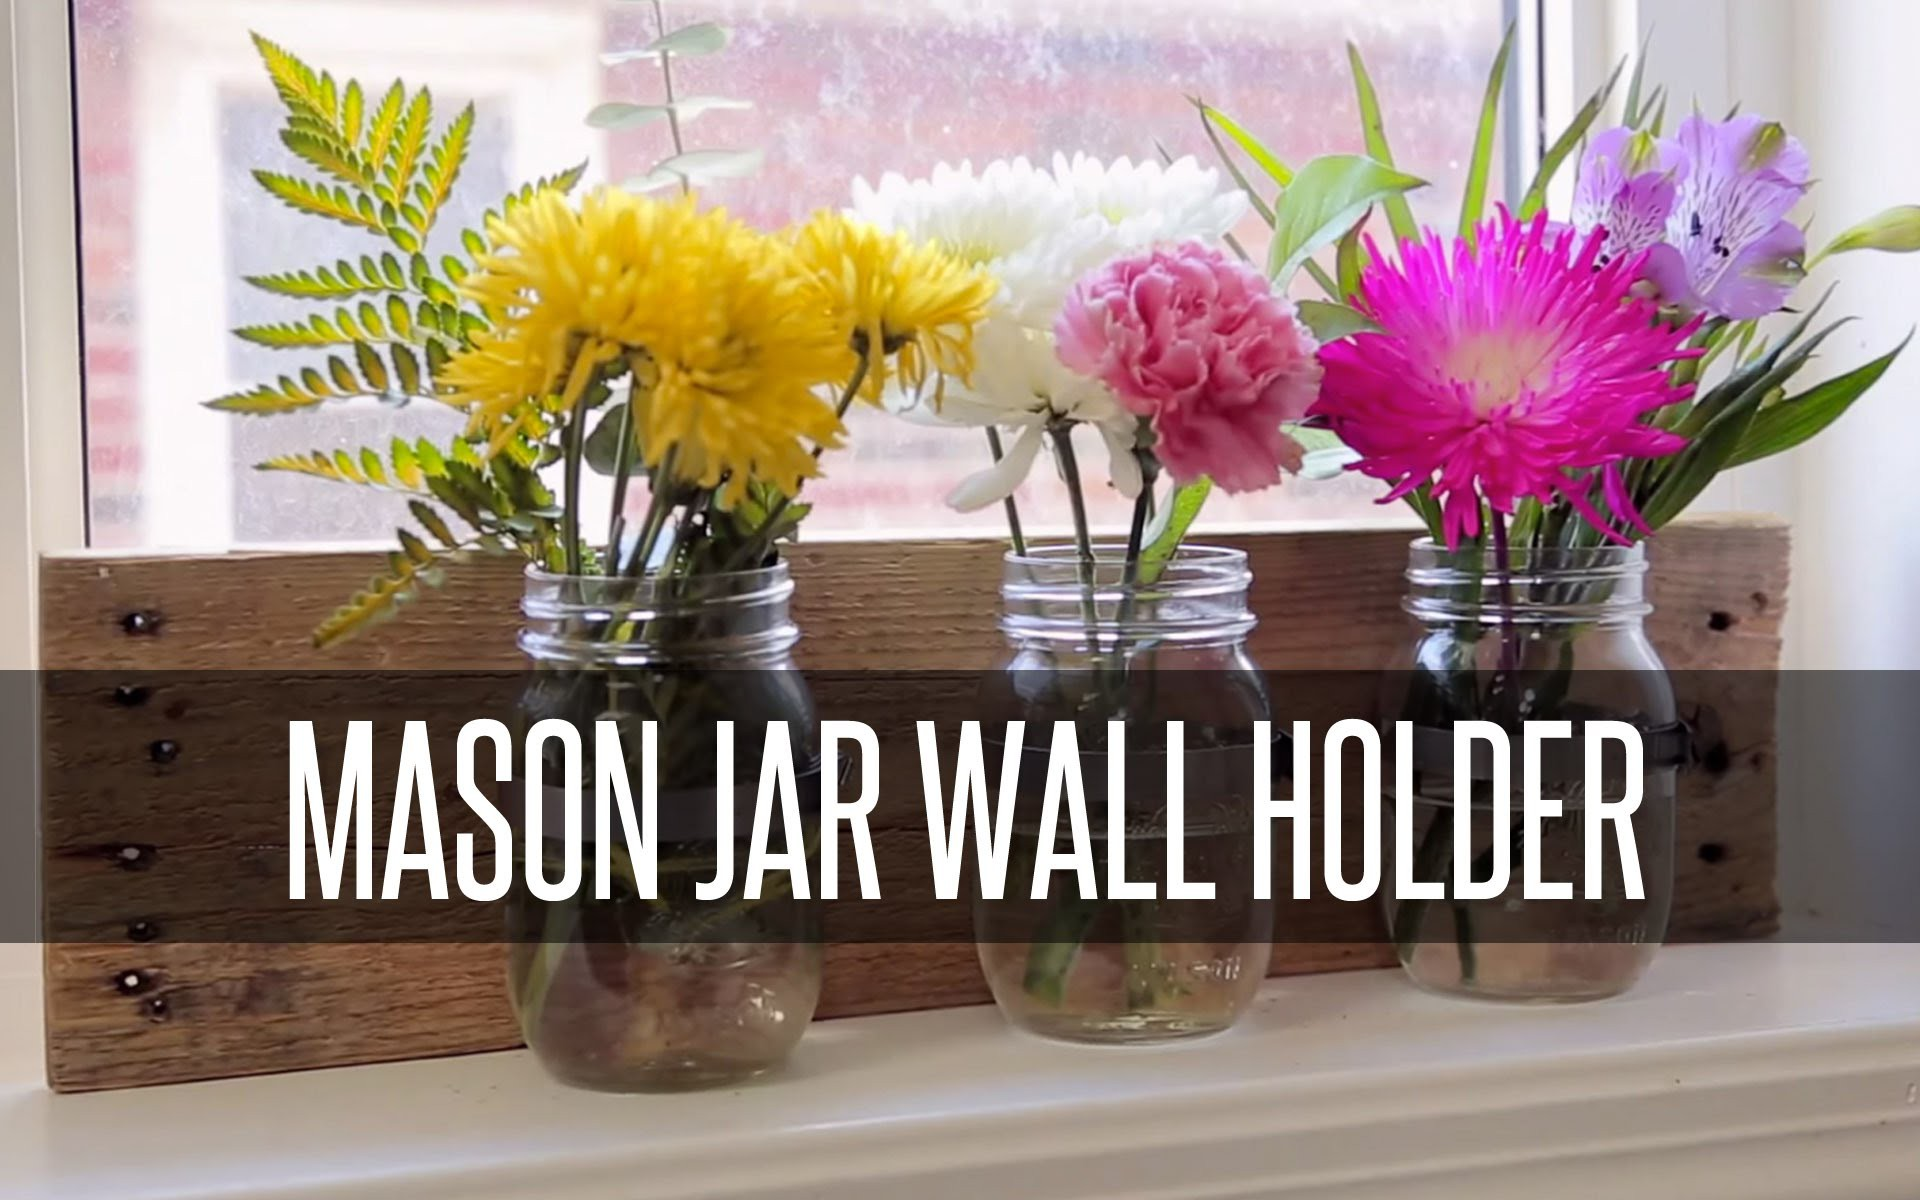 DIY RUSTIC MASON JAR WALL HOLDER